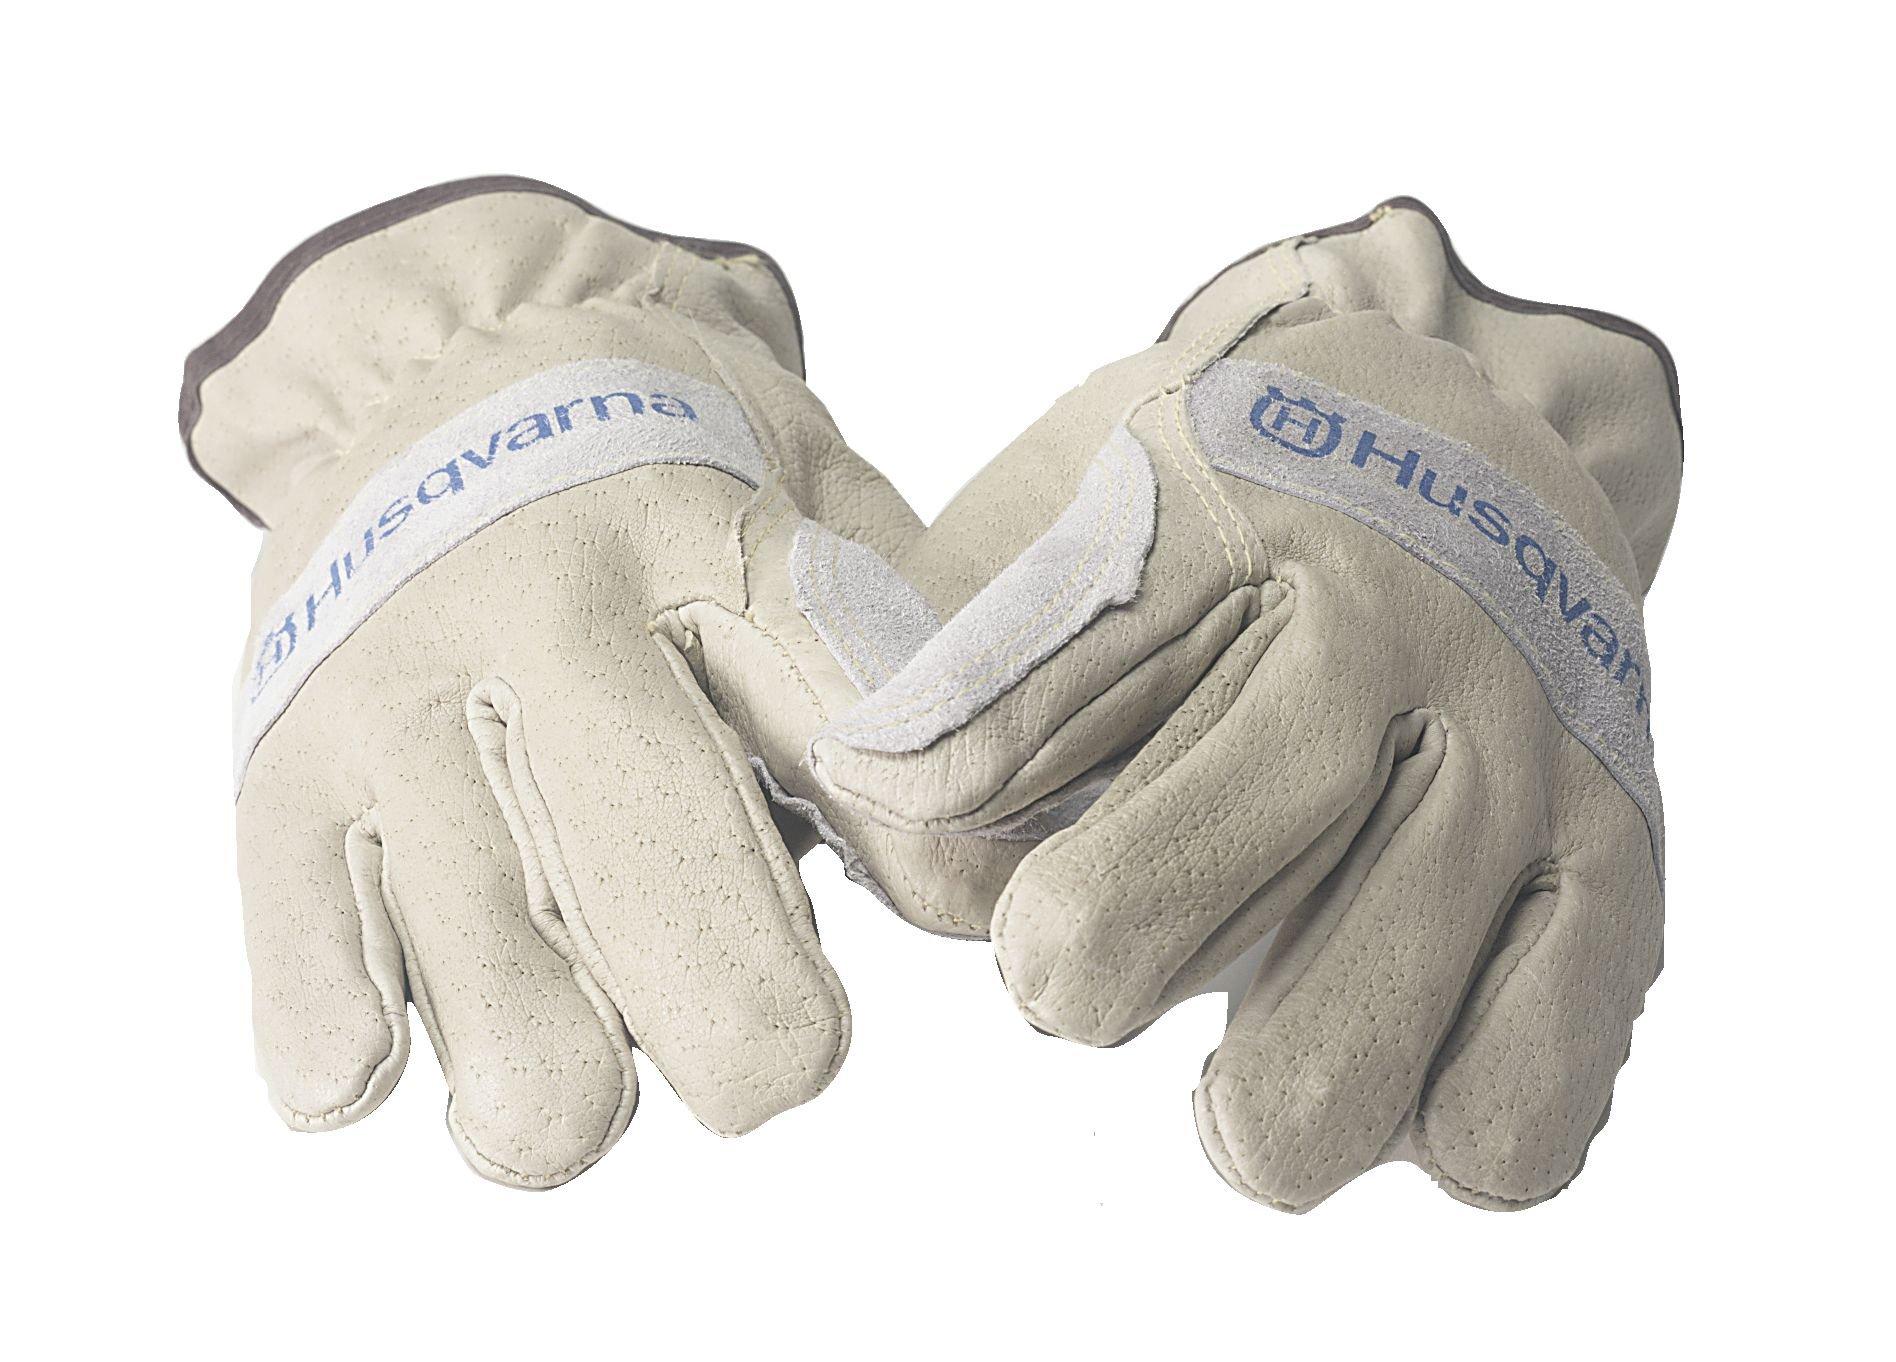 Husqvarna 531300273 Xtreme Duty Work Gloves, Medium